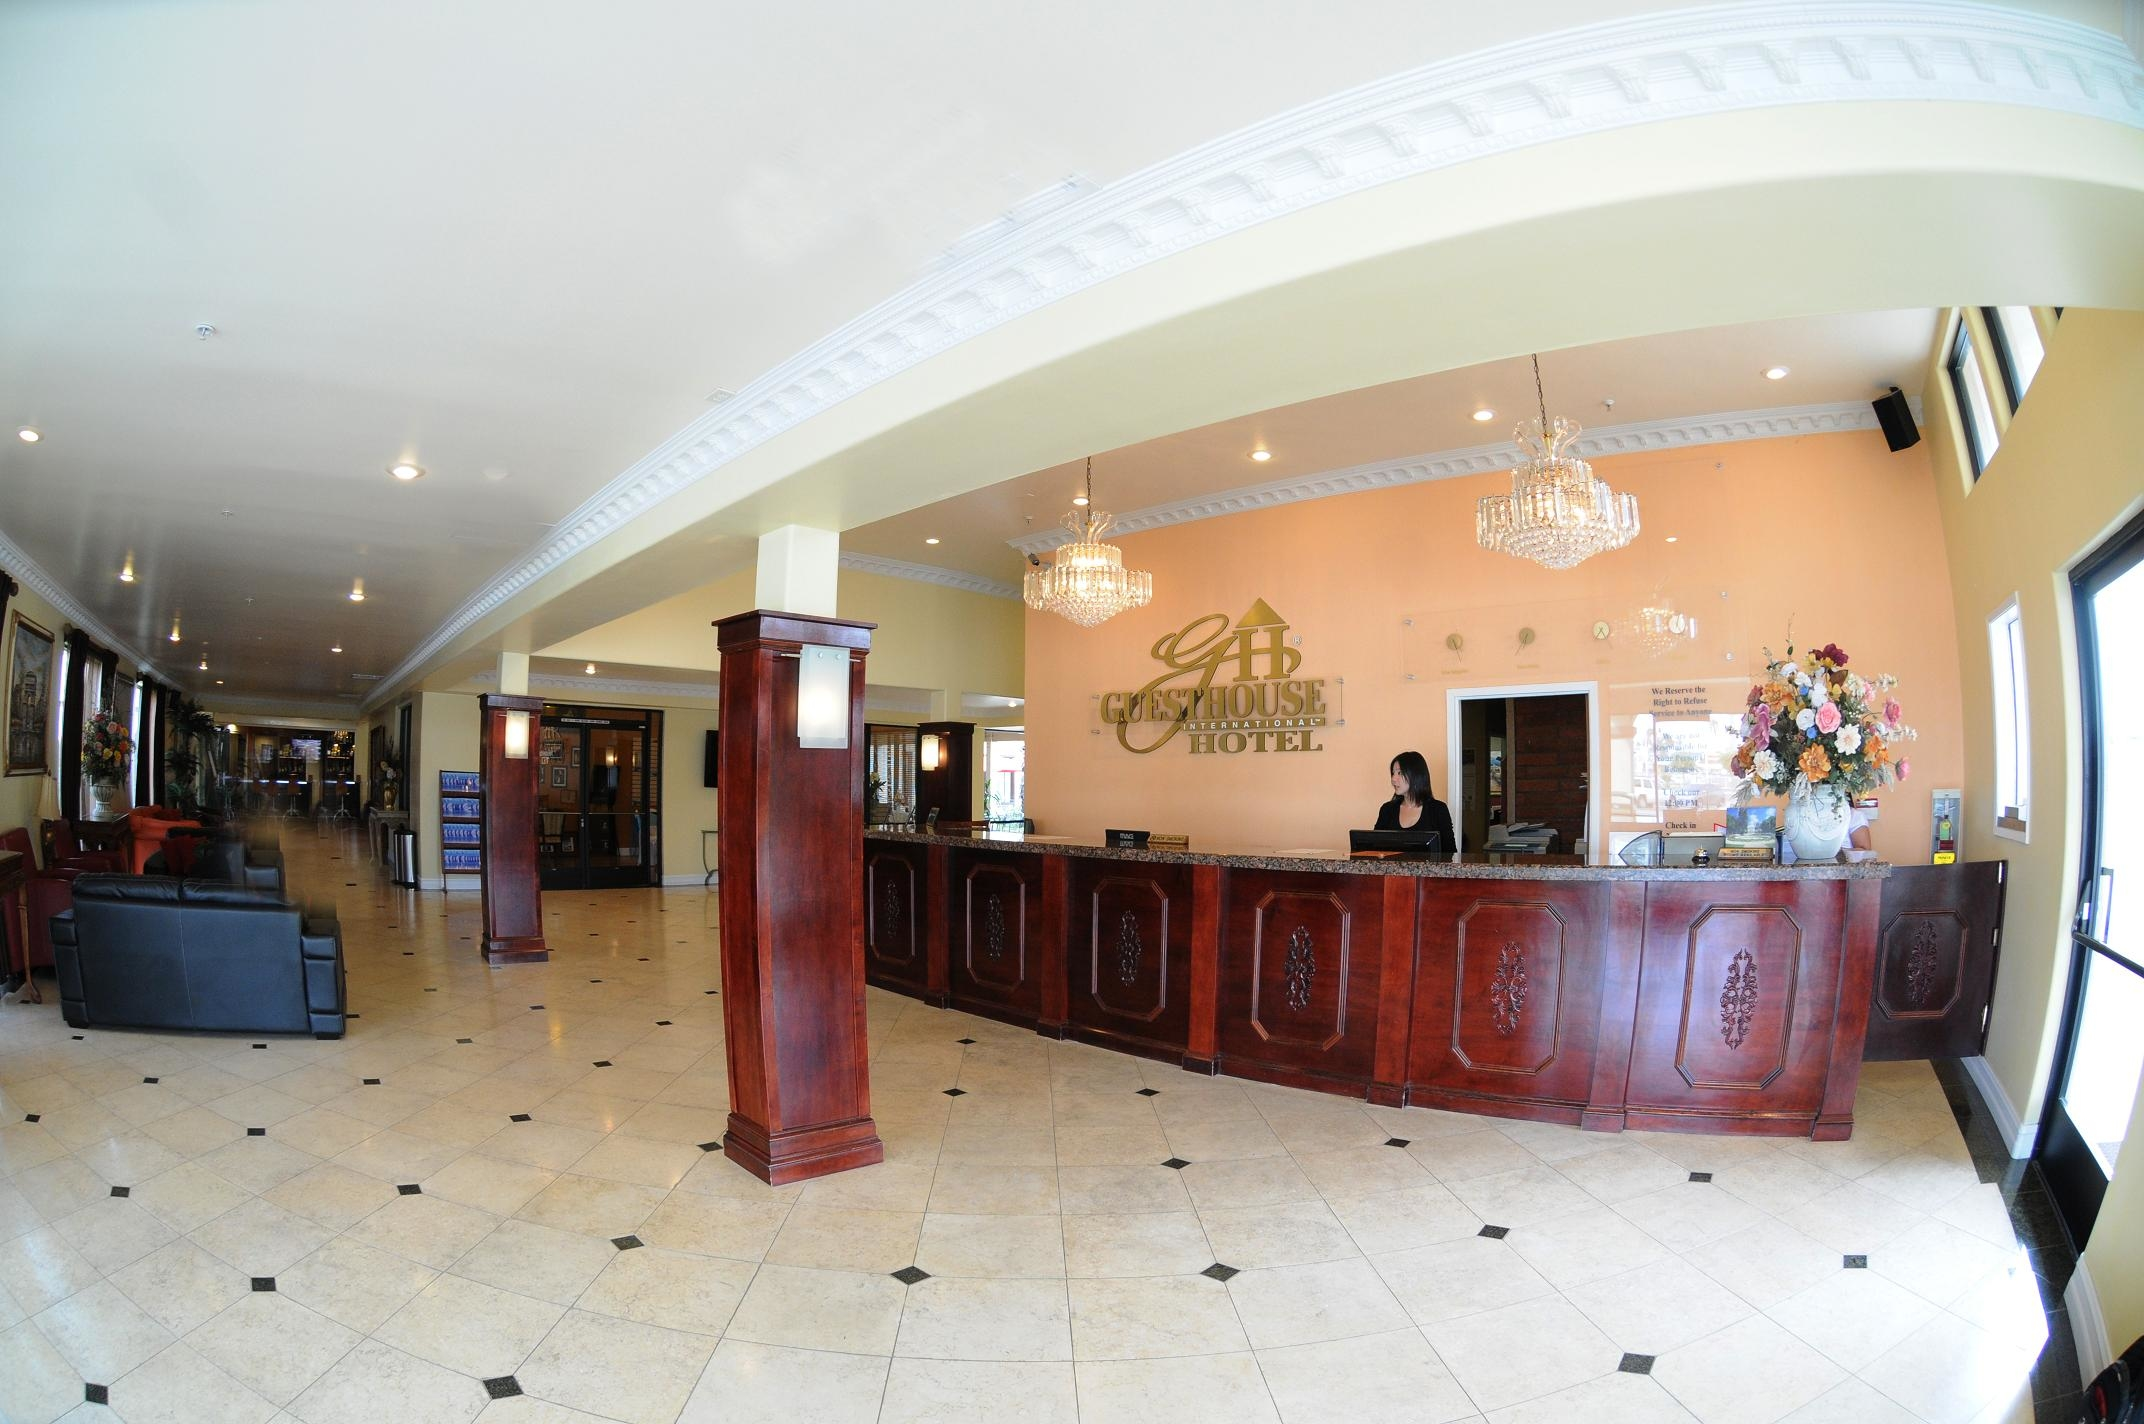 GuestHouse Hotel Norwalk image 0